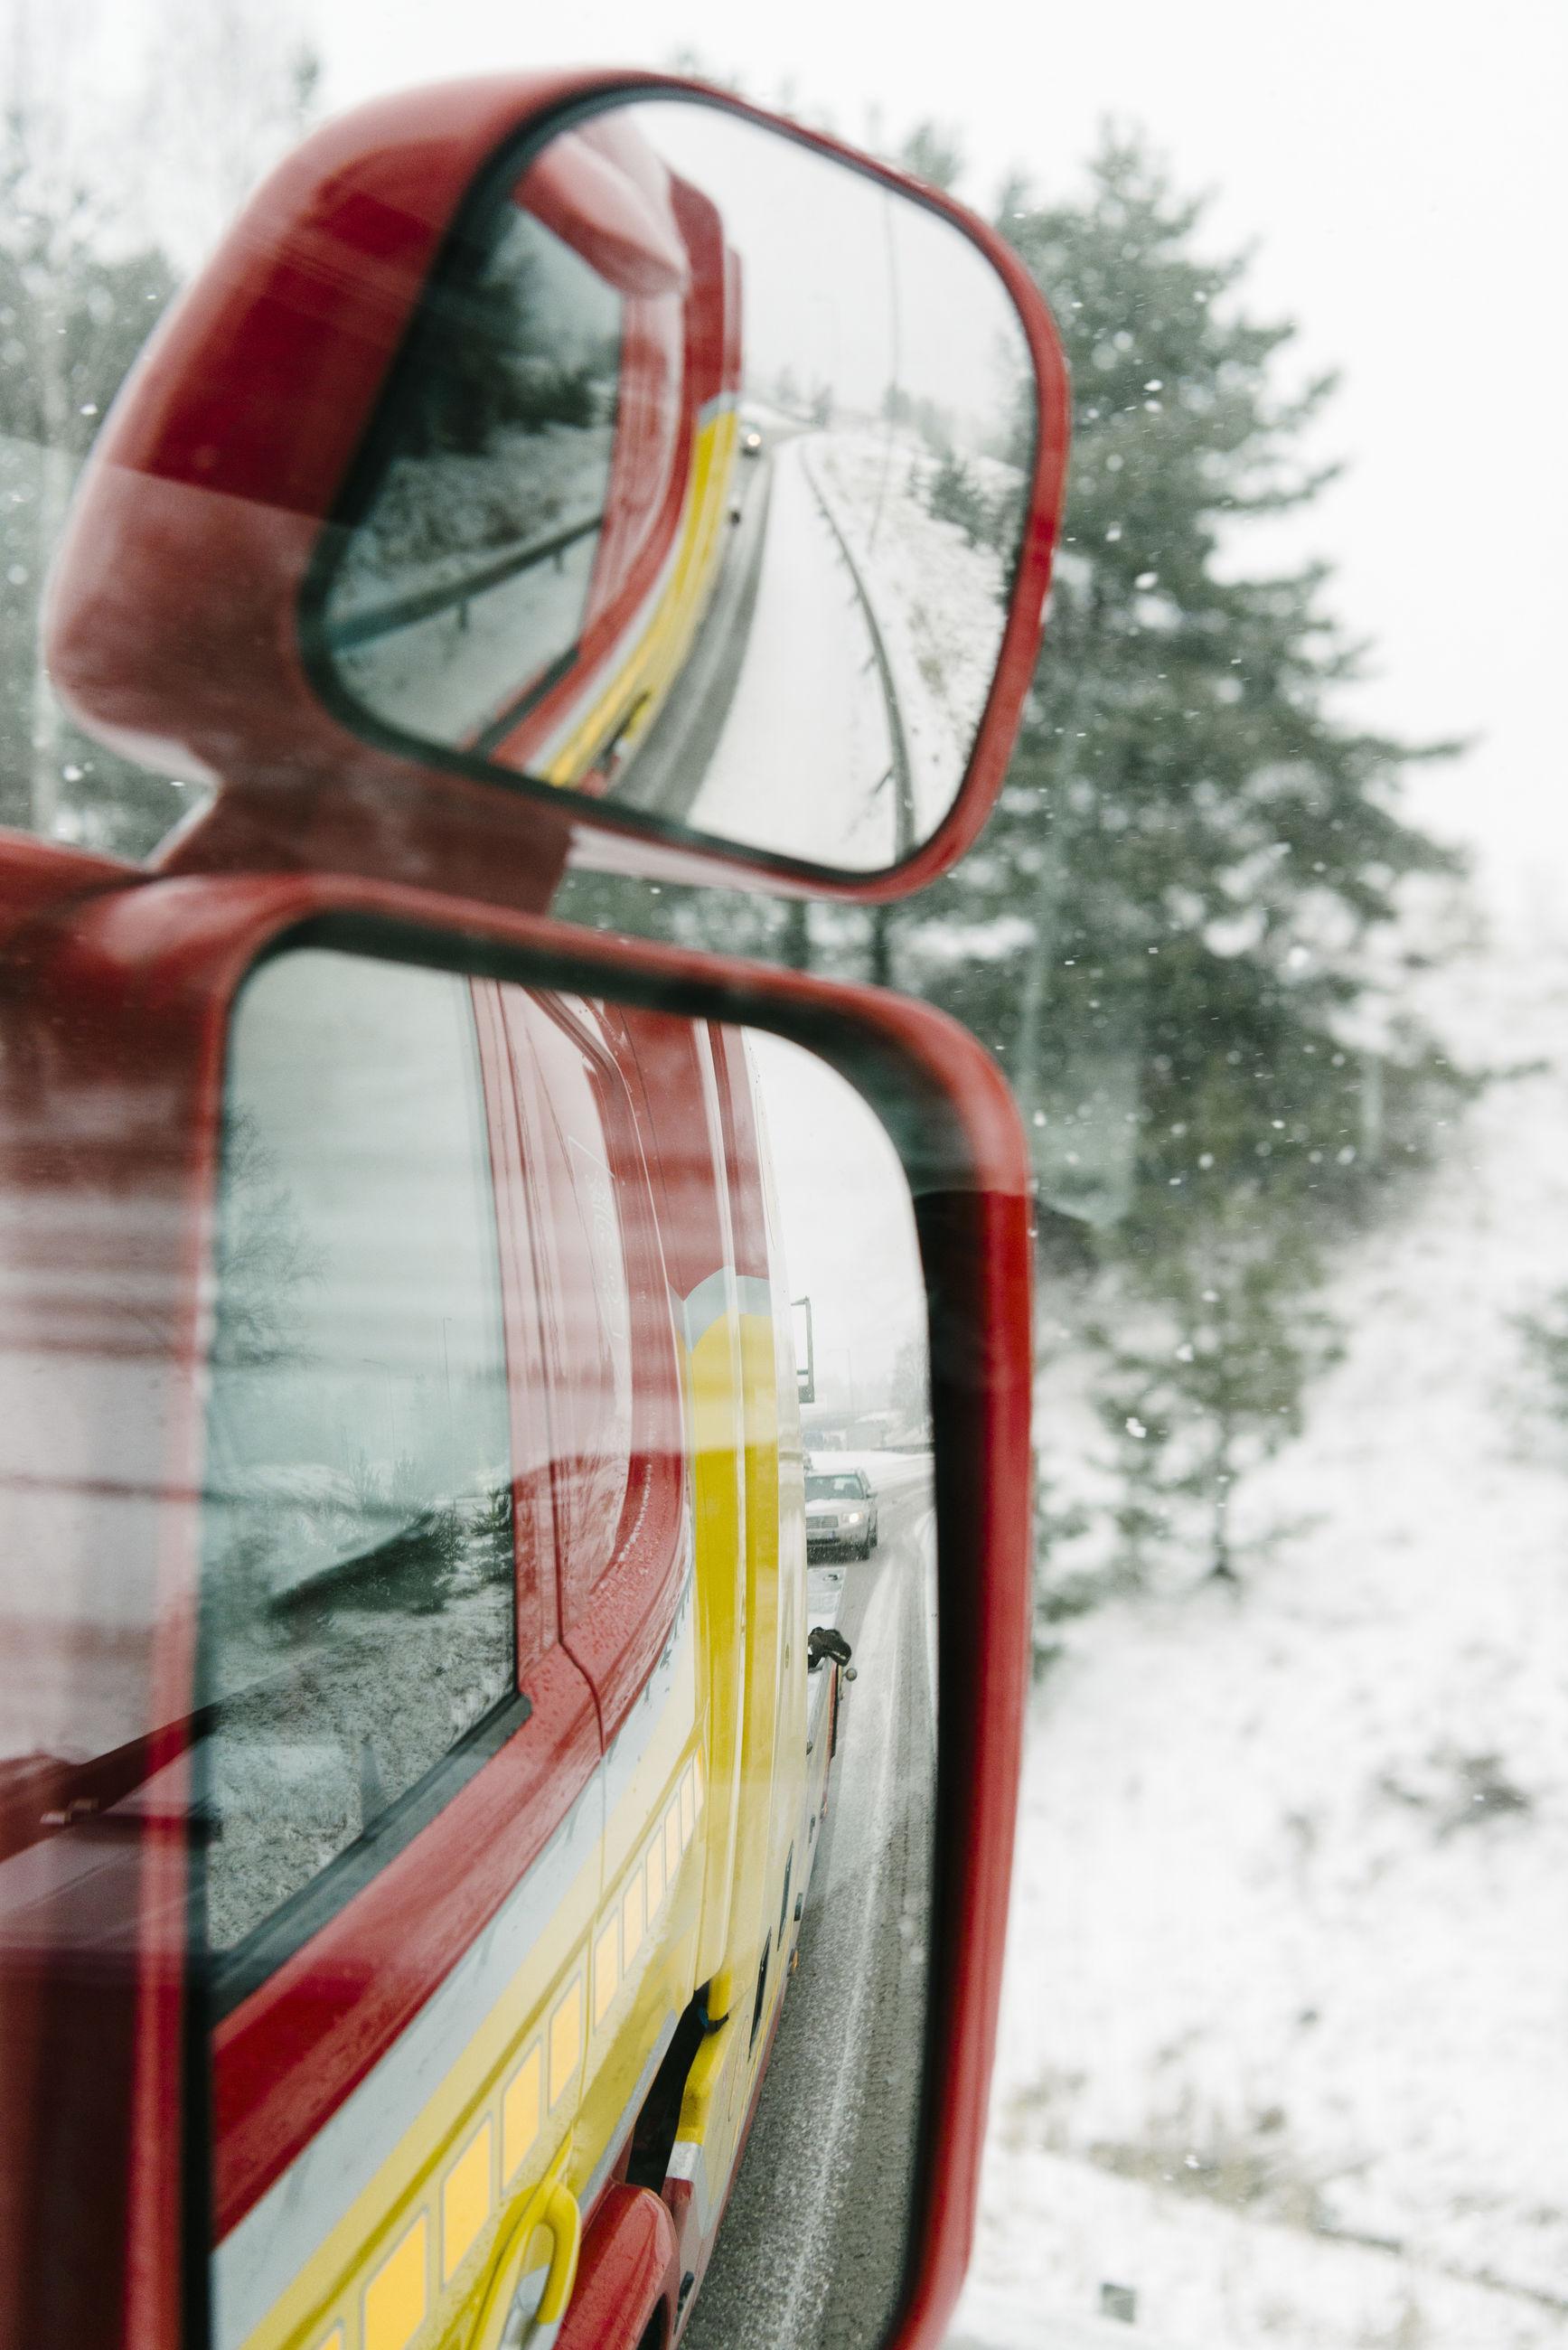 CLOSE-UP OF SNOW ON WINDOW